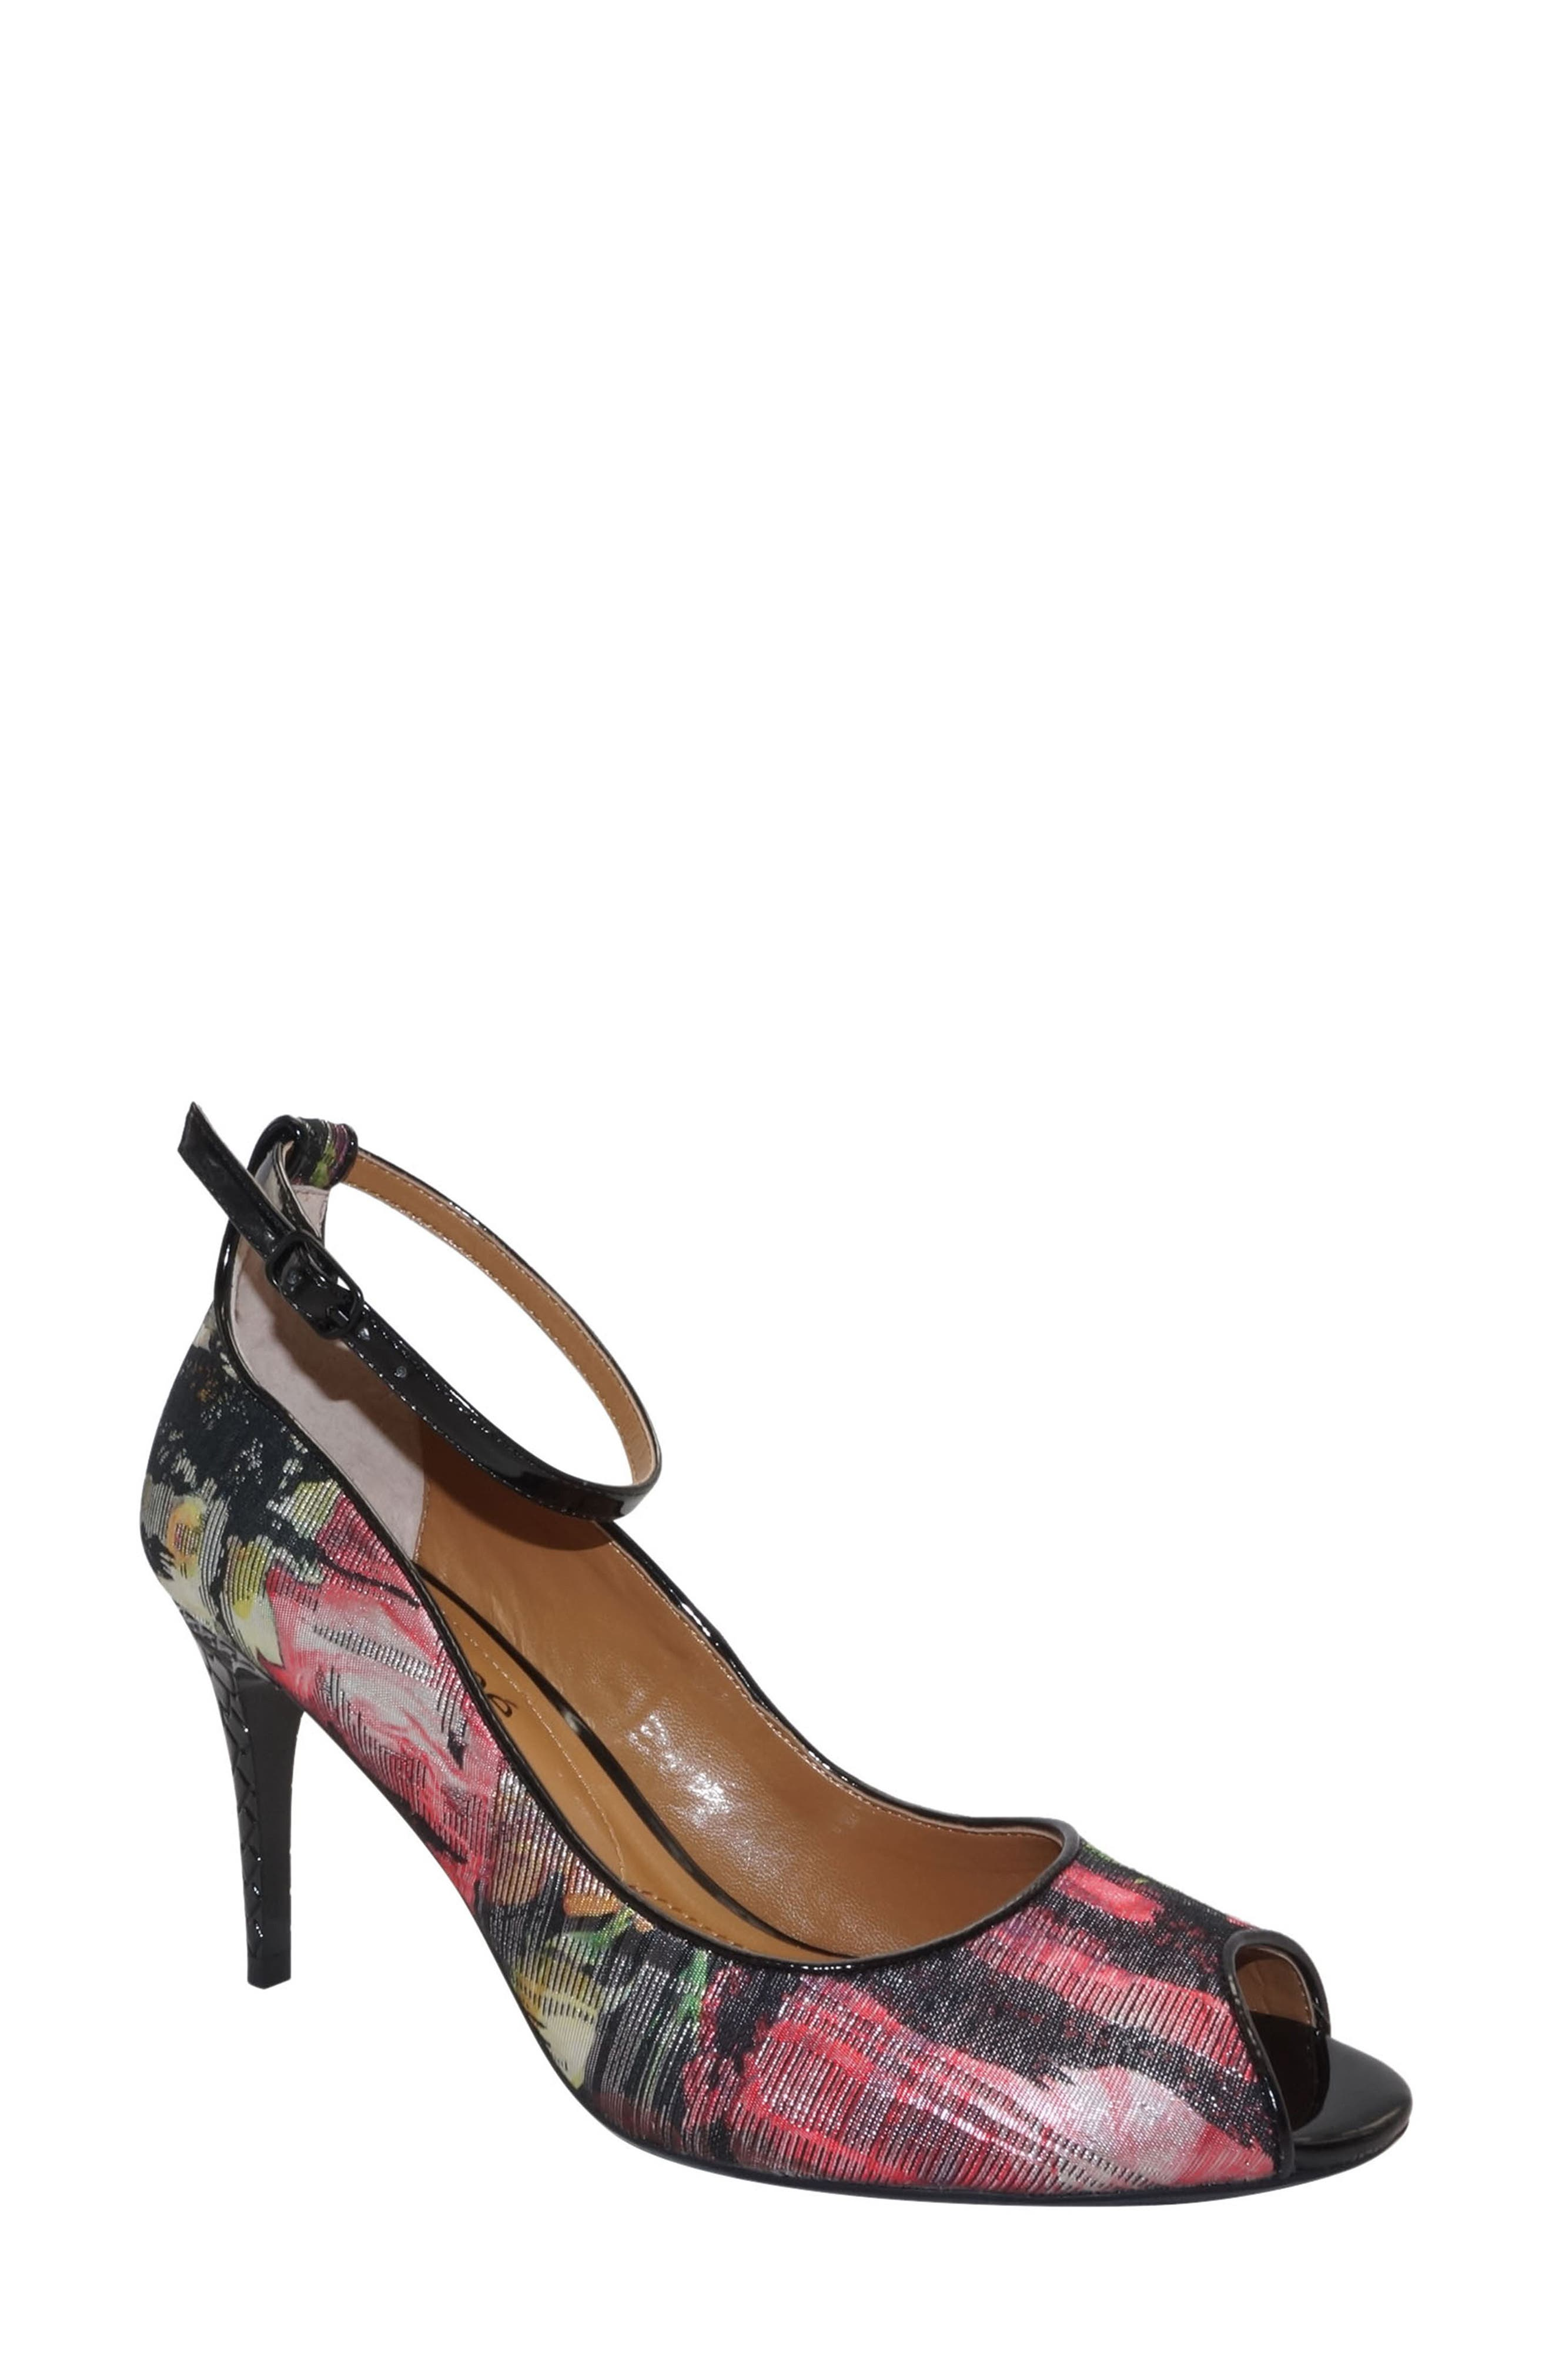 Raspalli Ankle Strap Peep Toe Pump,                         Main,                         color, Red/ Black Multi